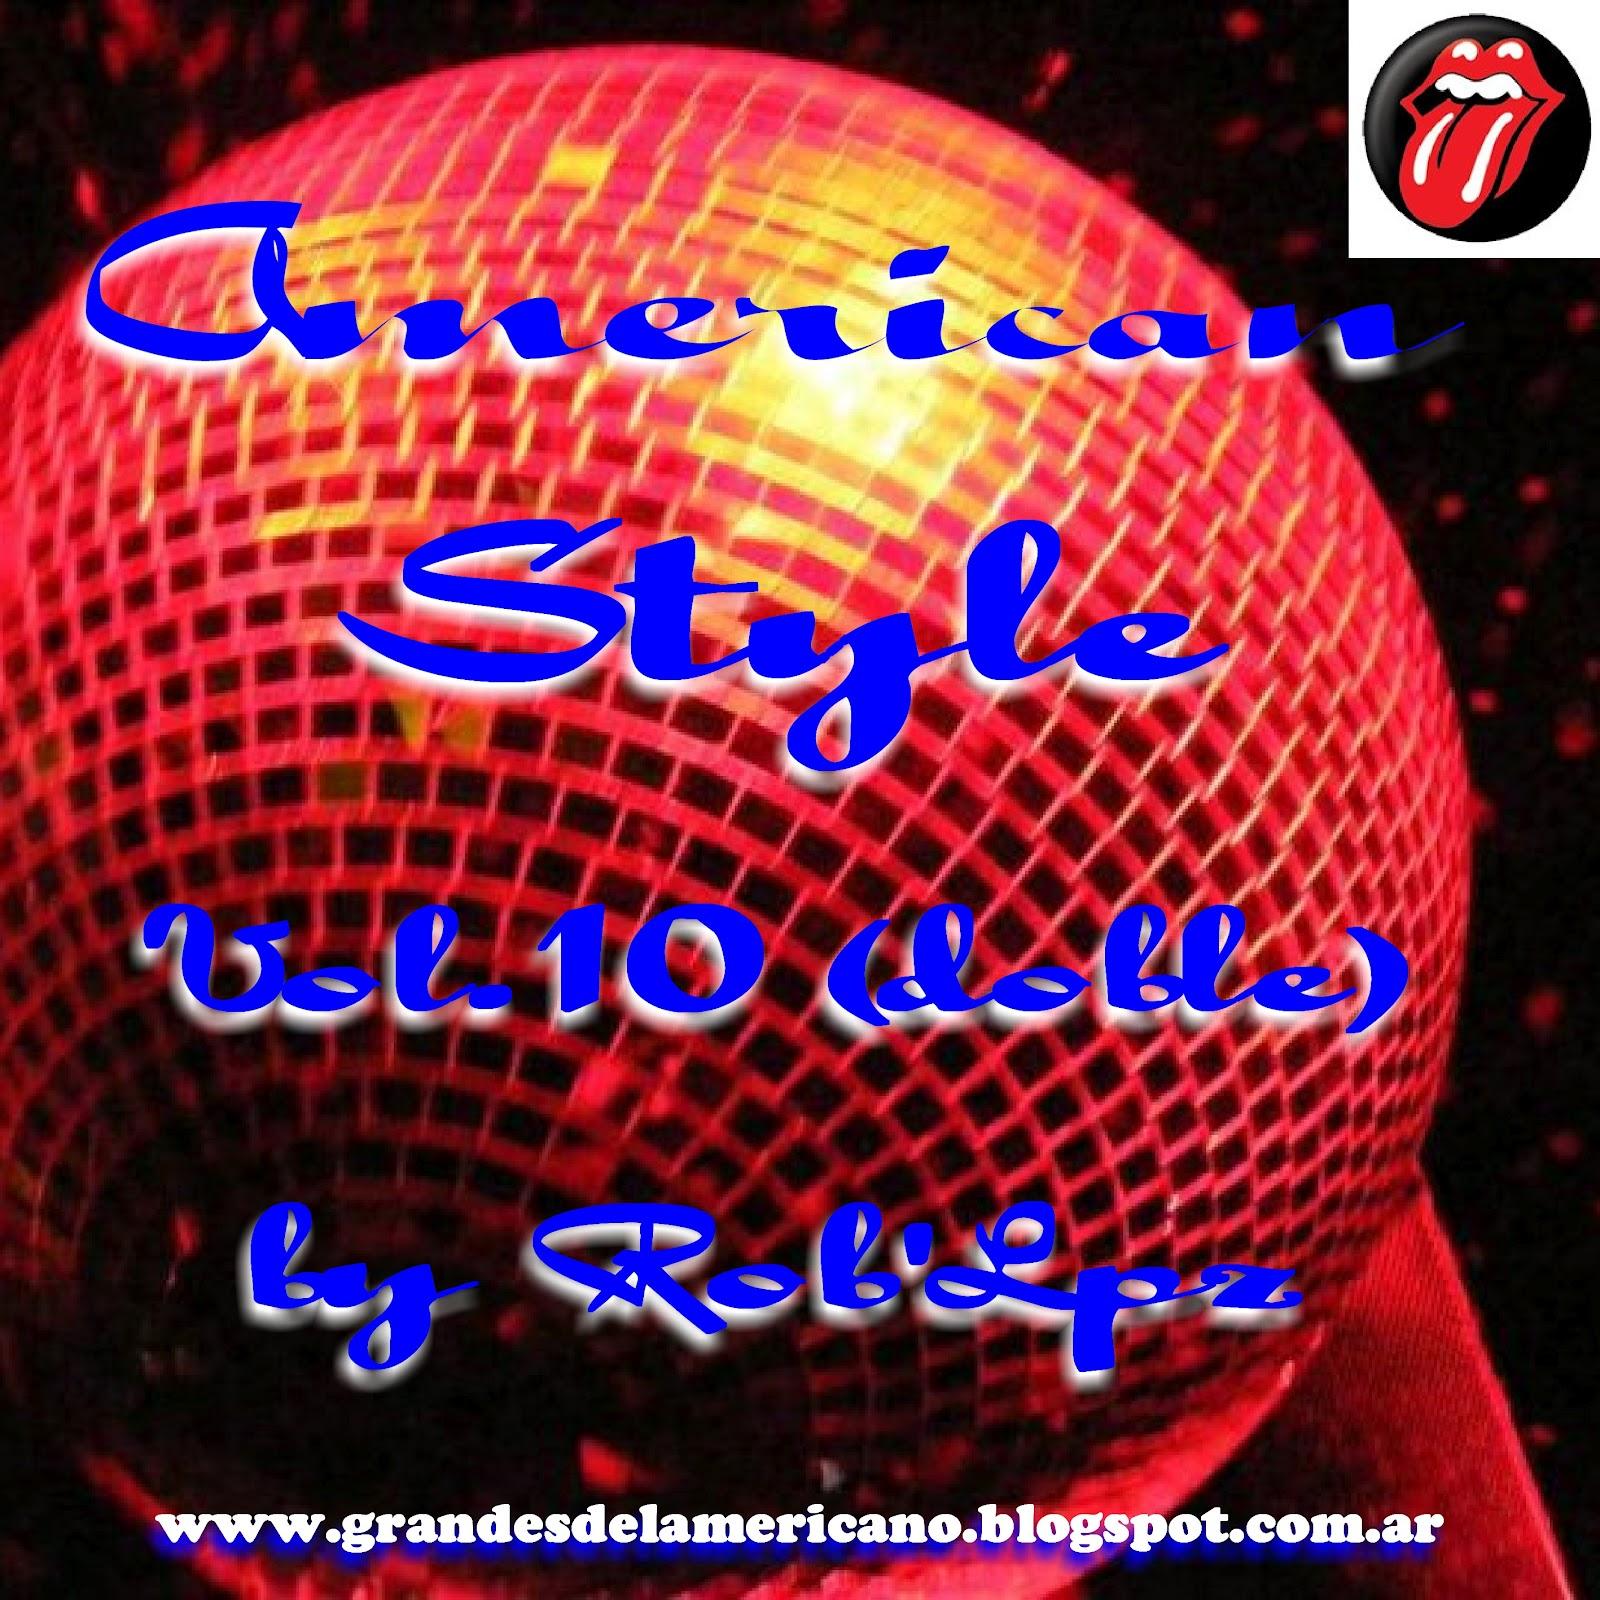 http://3.bp.blogspot.com/-OZtYMzdCqLQ/T48hCNZKbqI/AAAAAAAABJY/aXgGLBbtC7s/s1600/ZZ.AST010by+ROBLPZ.jpg